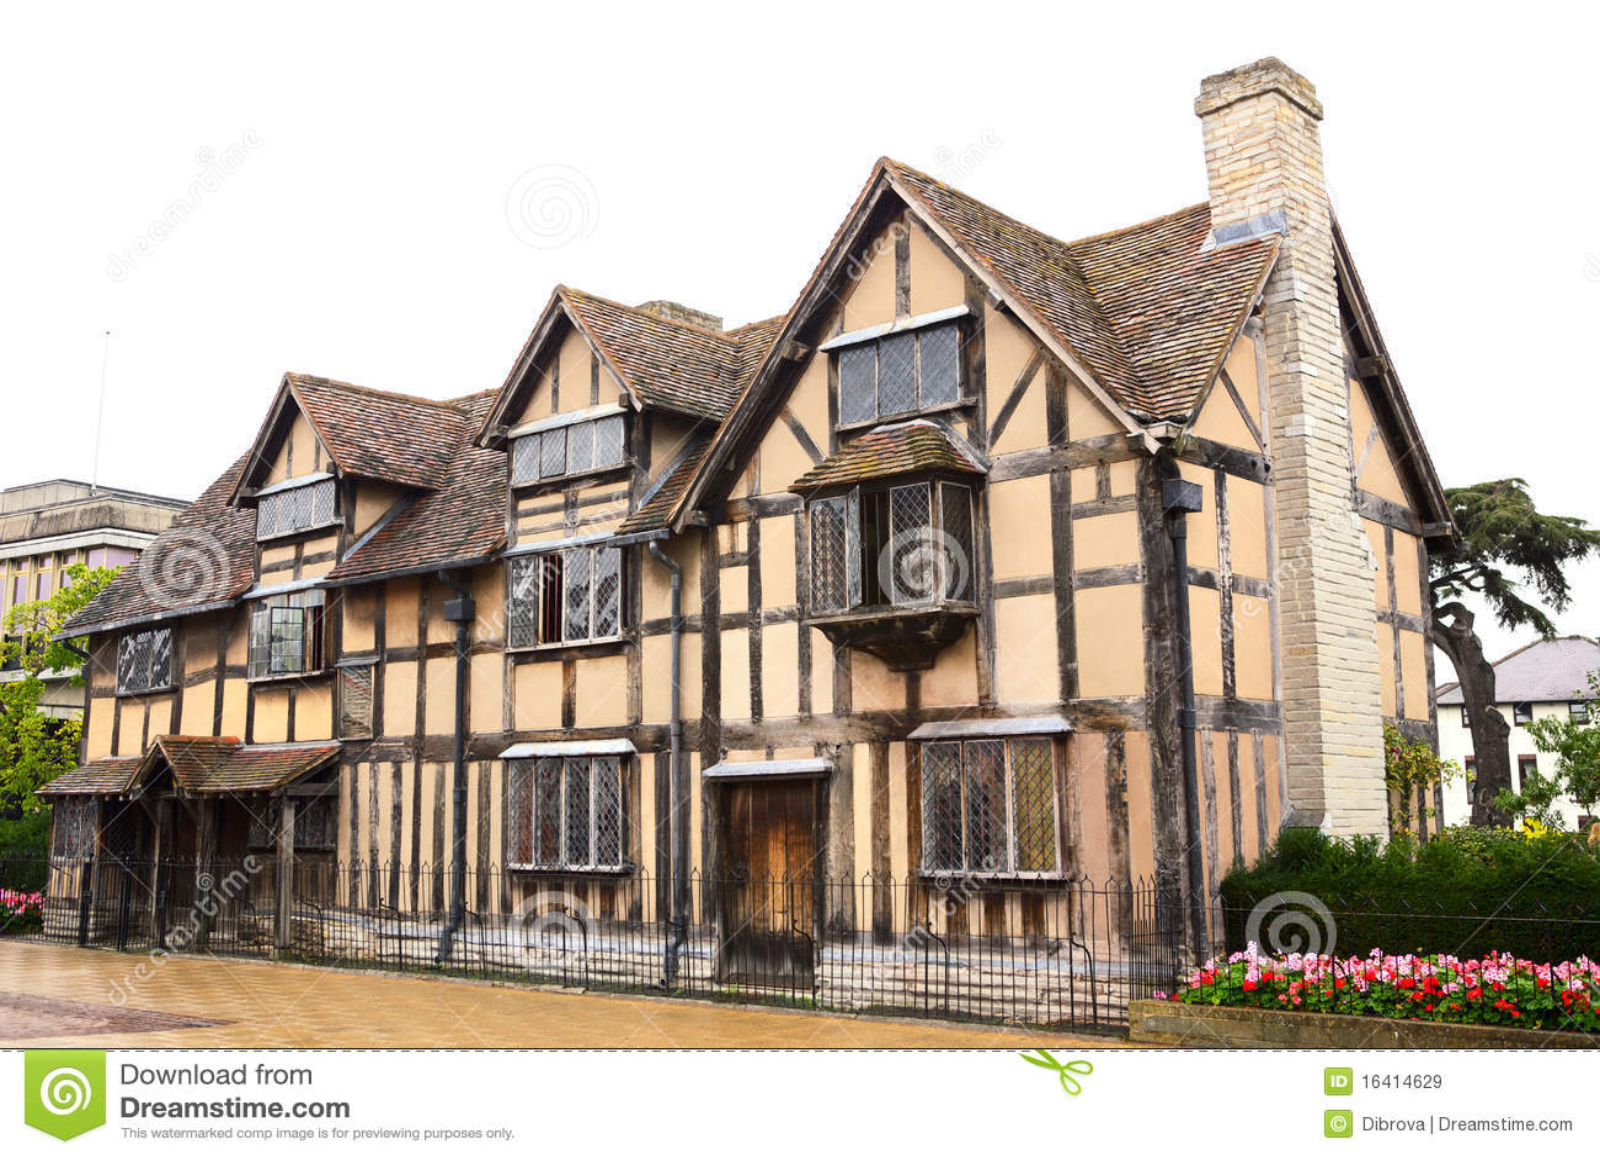 William Shakespeare S House